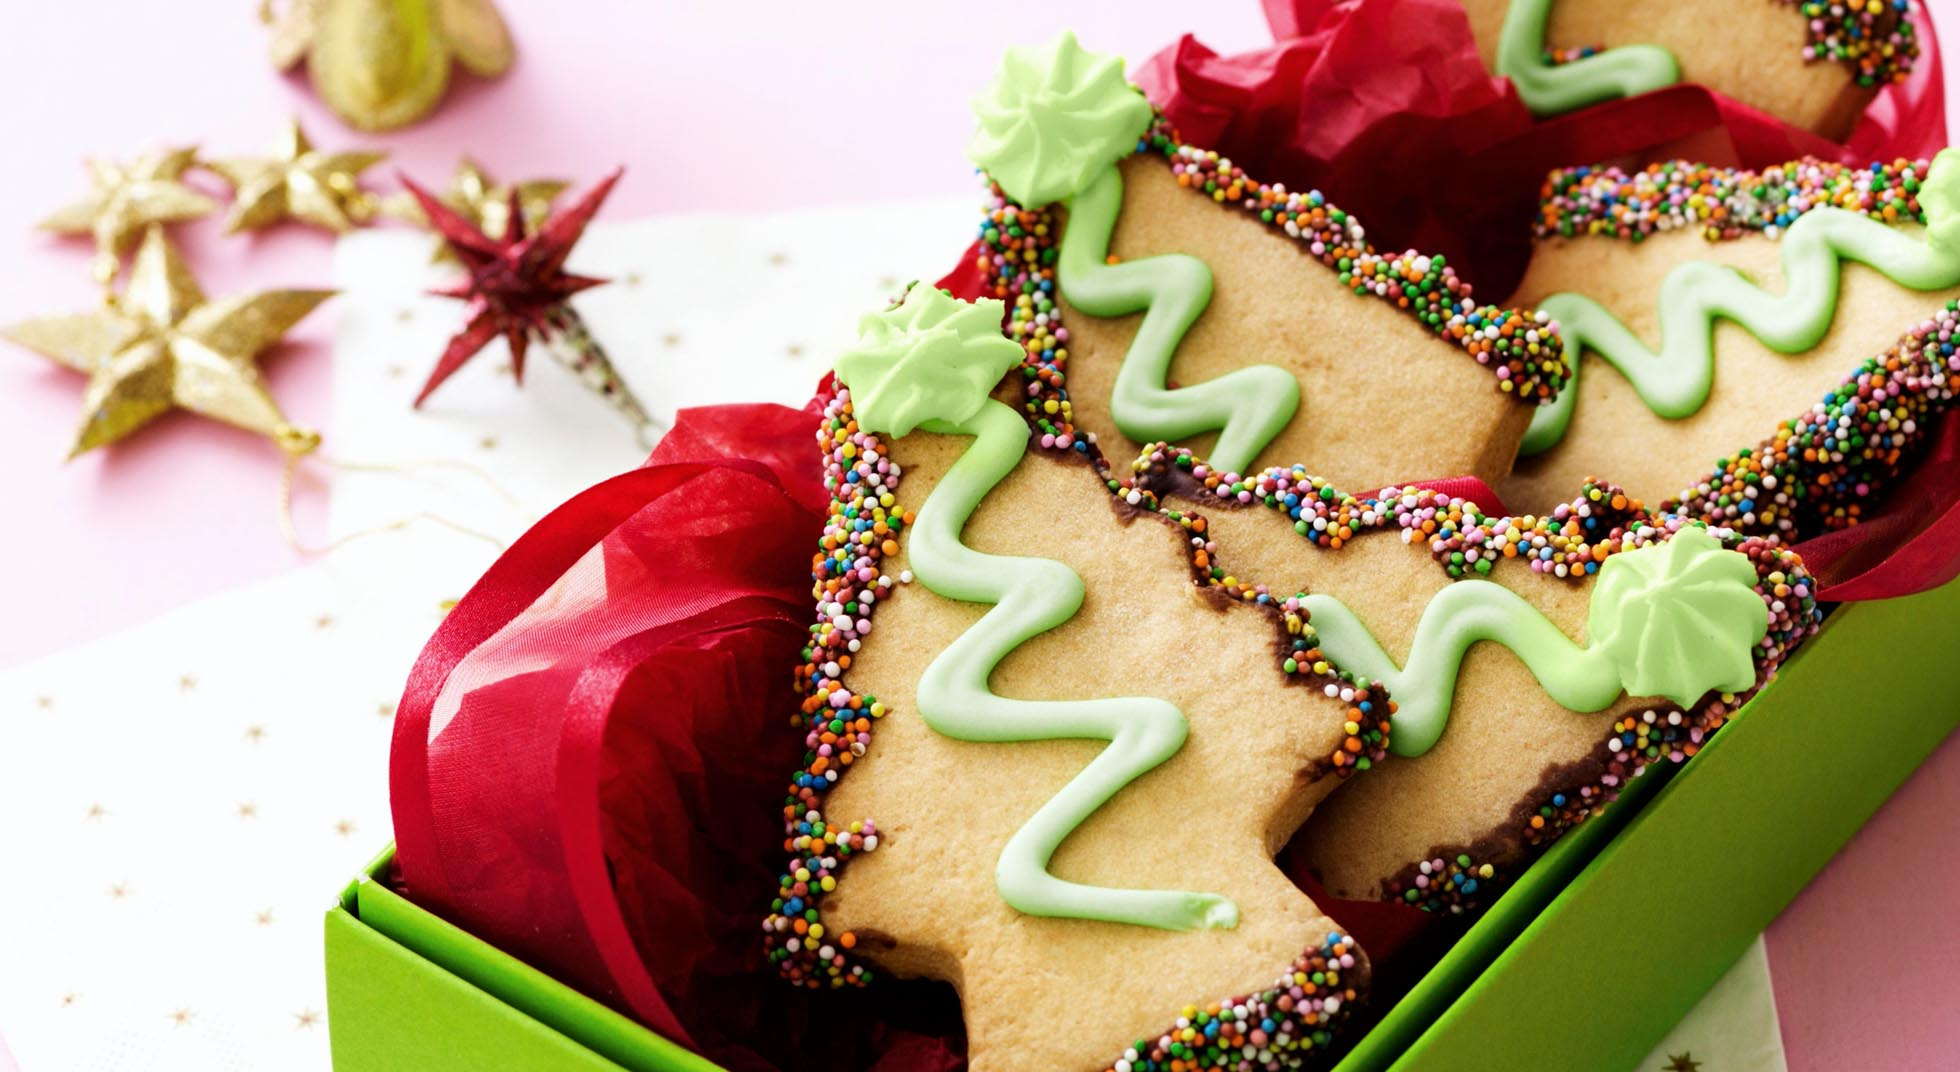 regali di natale fatti a mano in cucina aia food On regali di natale fatti a mano in cucina